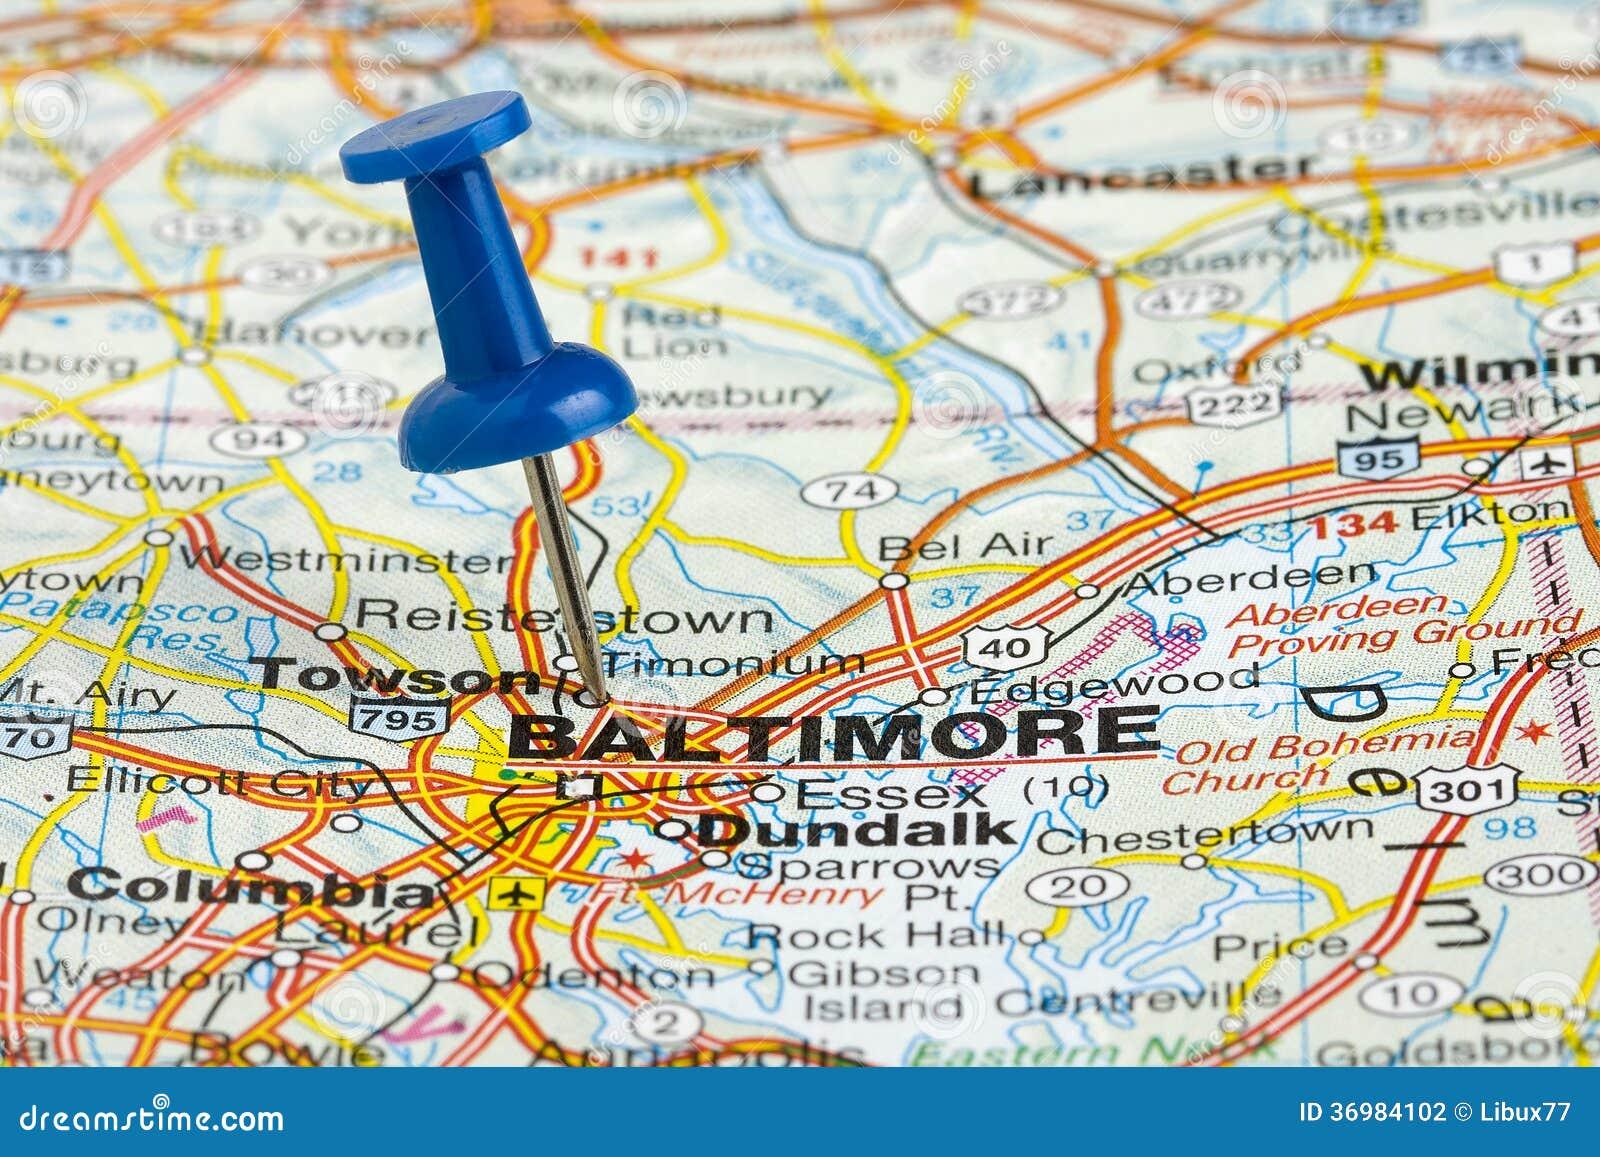 Baltimore Maryland Map Usa Swimnovacom - 95 of us map highlighted